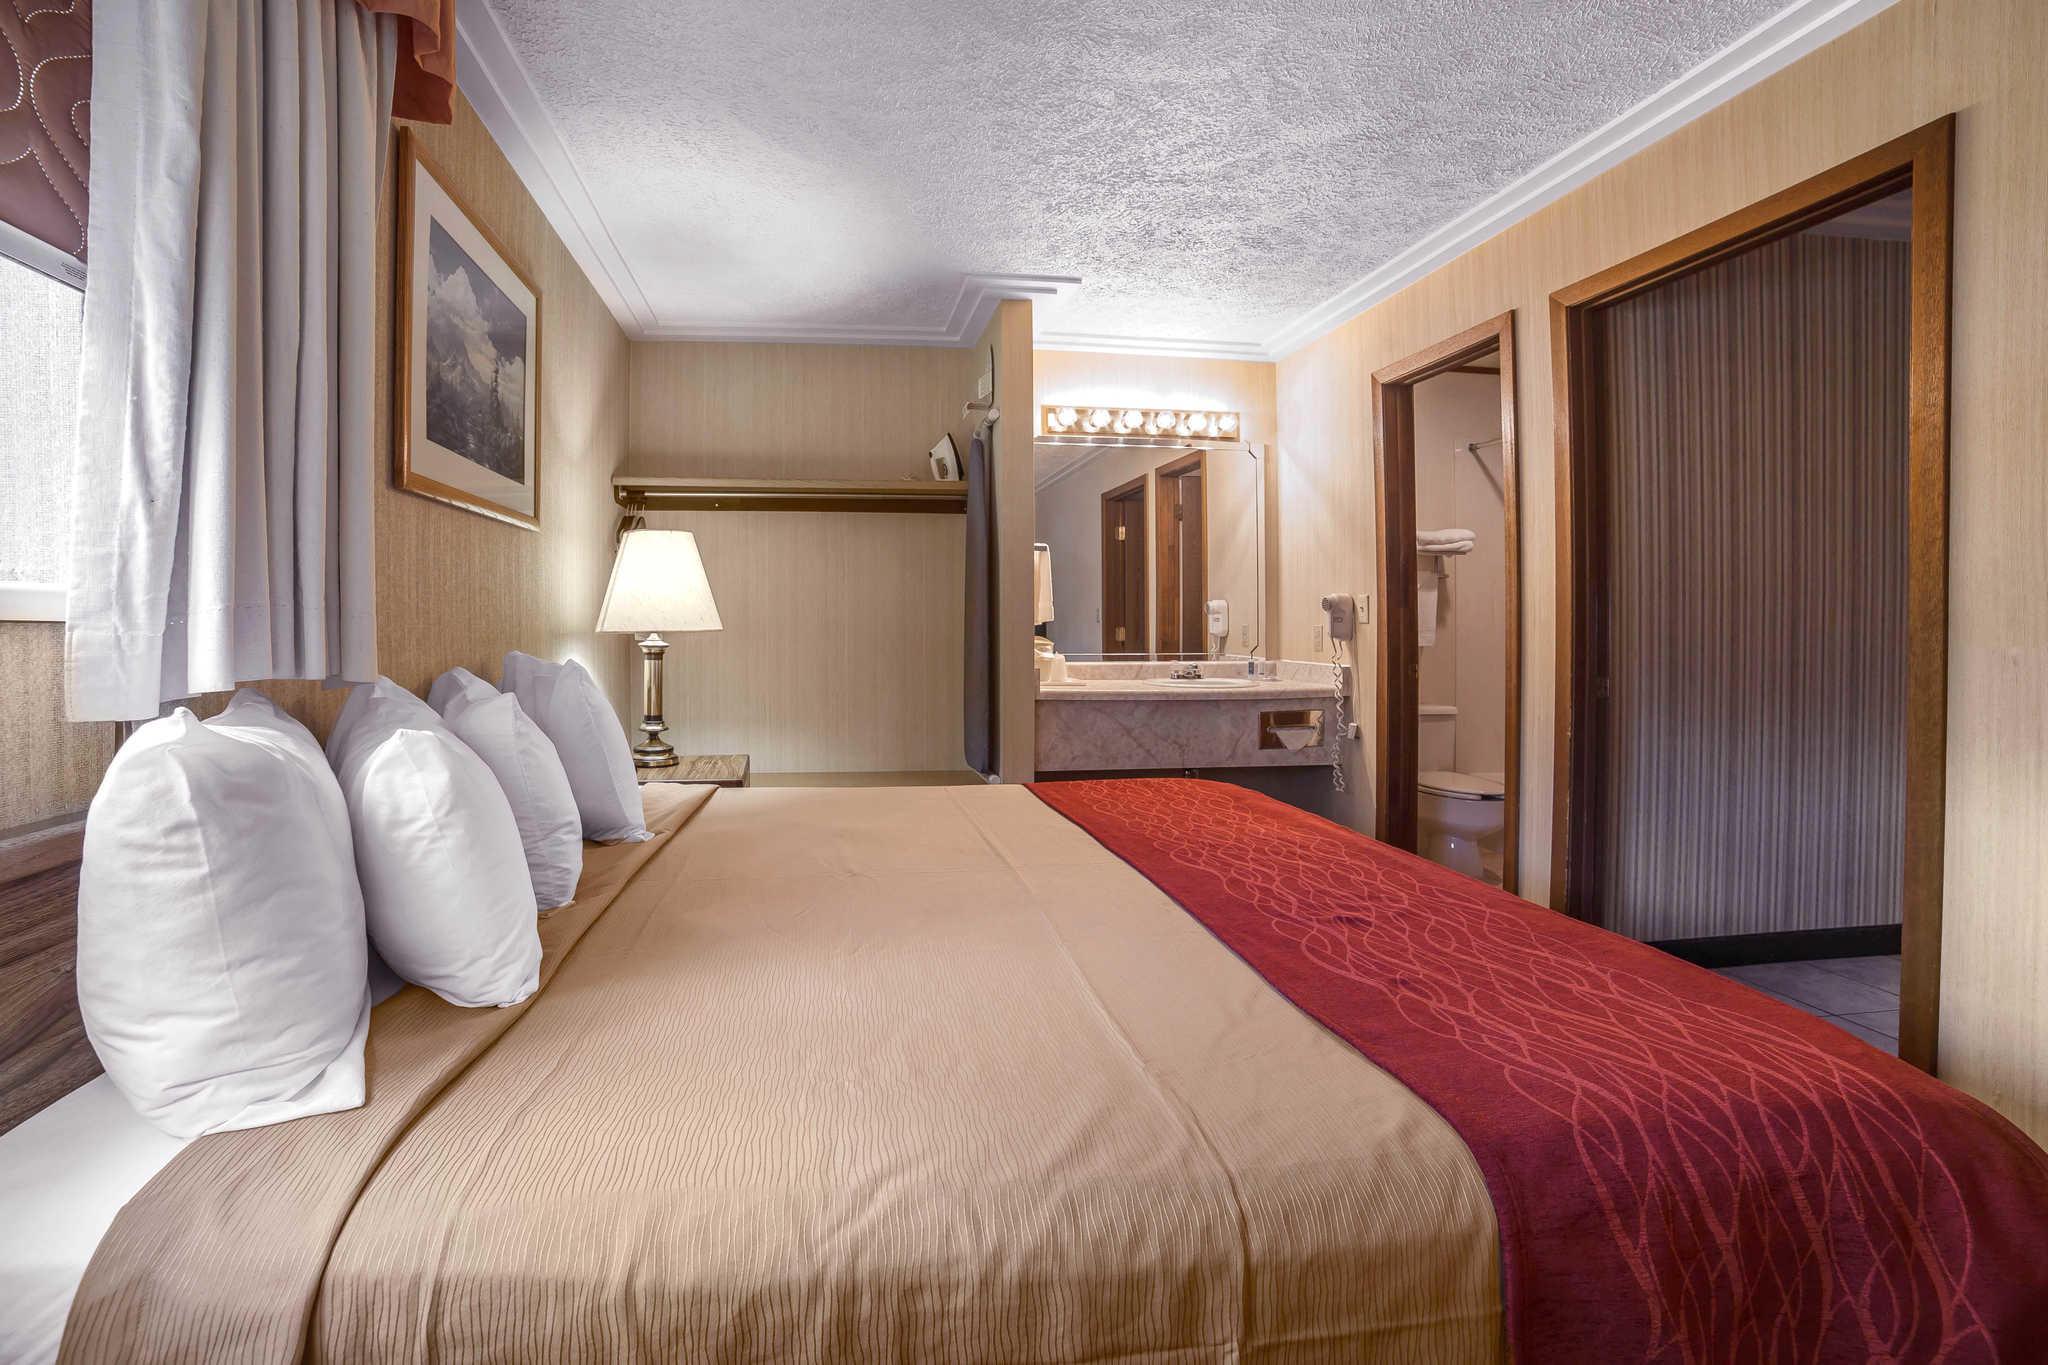 Rodeway Inn Pronghorn Lodge image 18